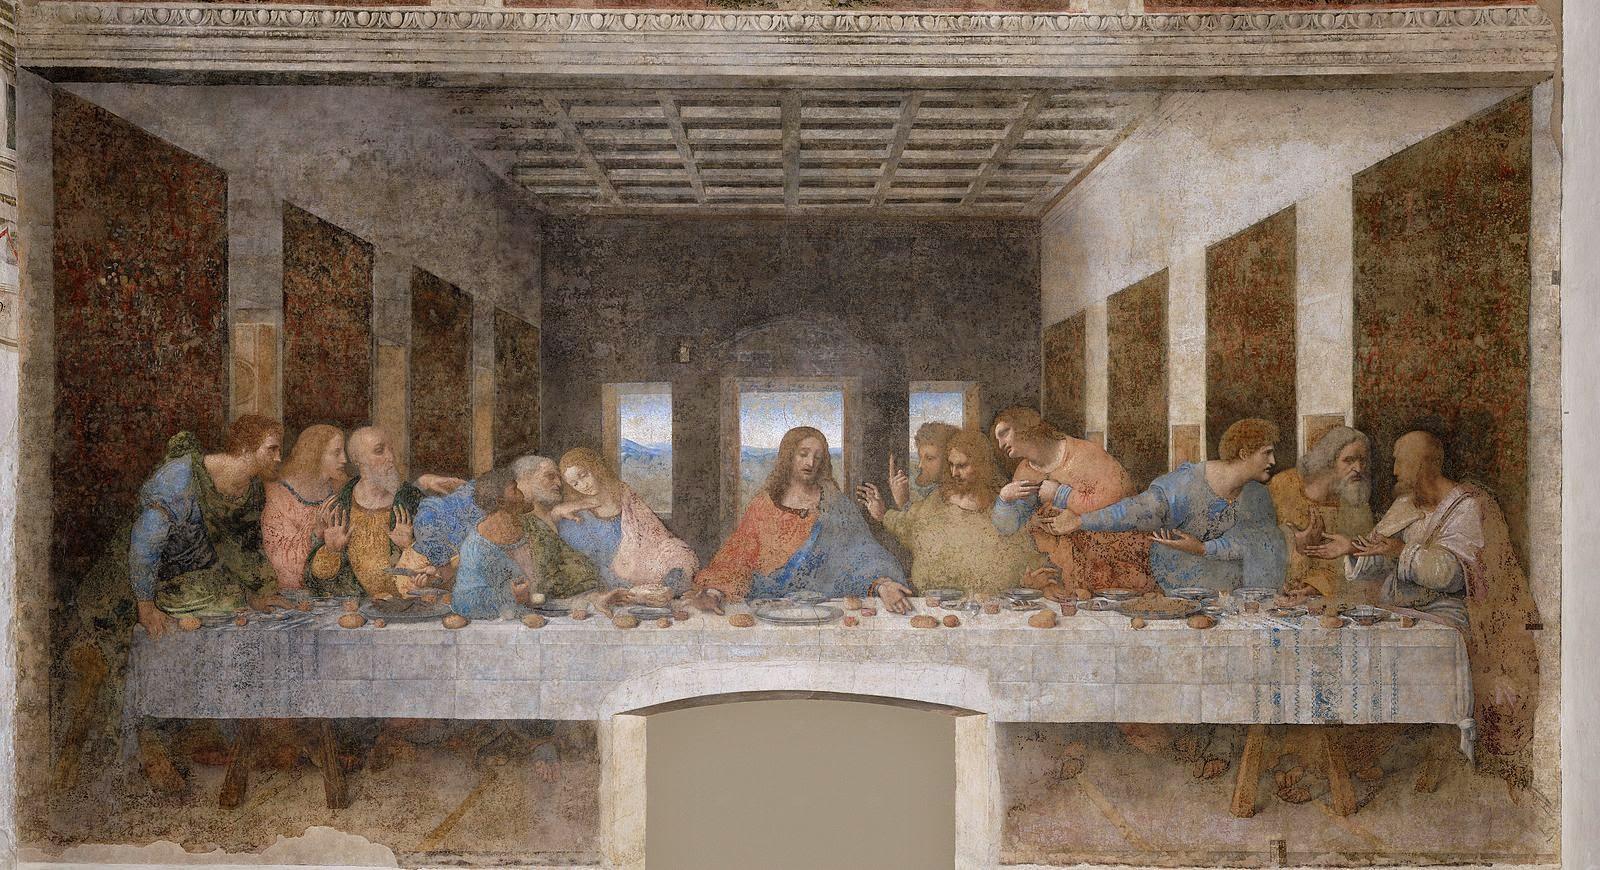 La última cena obra maestra del artista italiano Leonardo da Vinci.